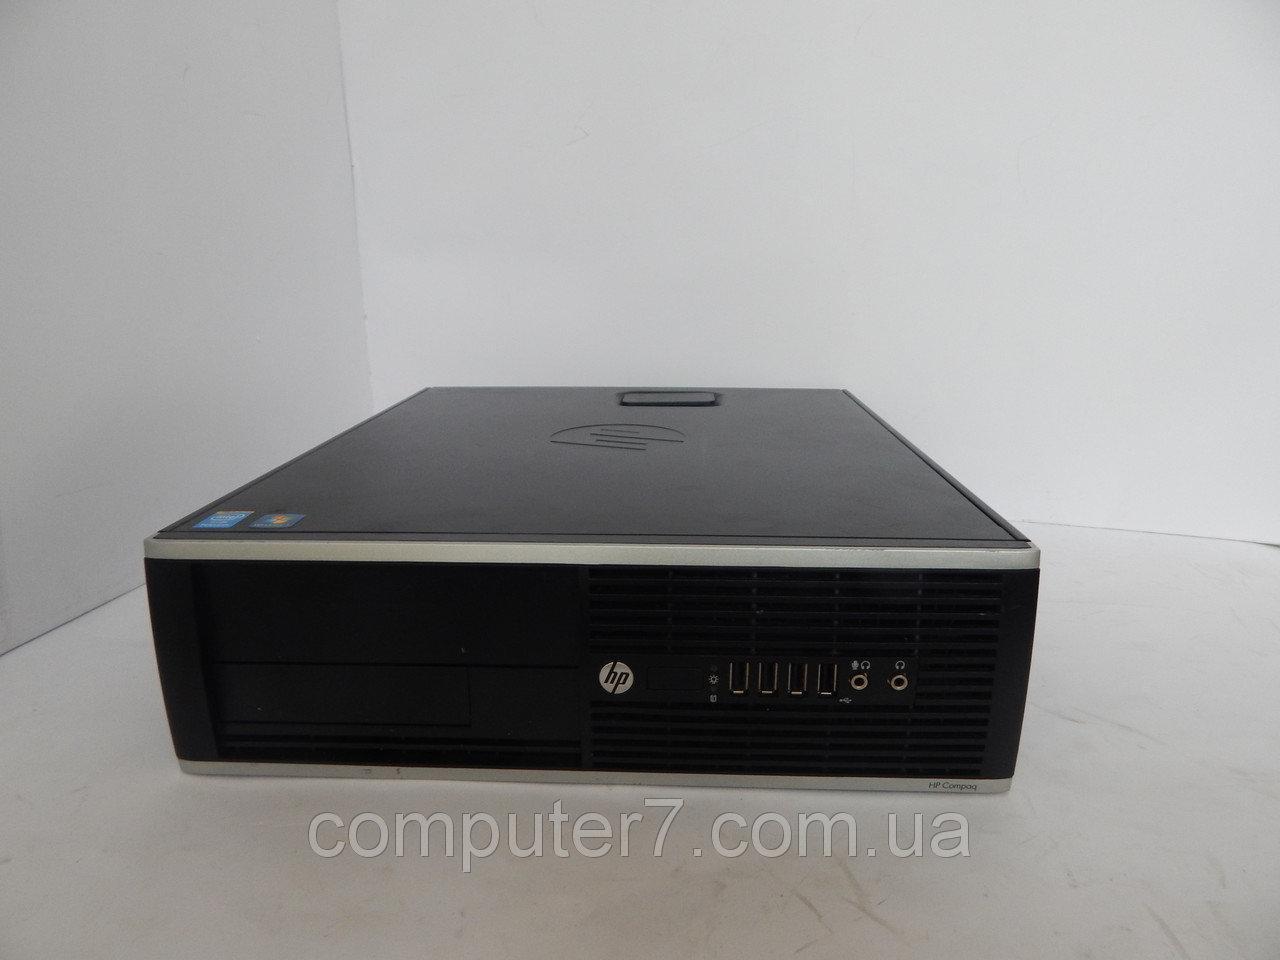 Системный блок компьютер б/у HP 6300 G2020 RAM 4 ГБ USB 3.0